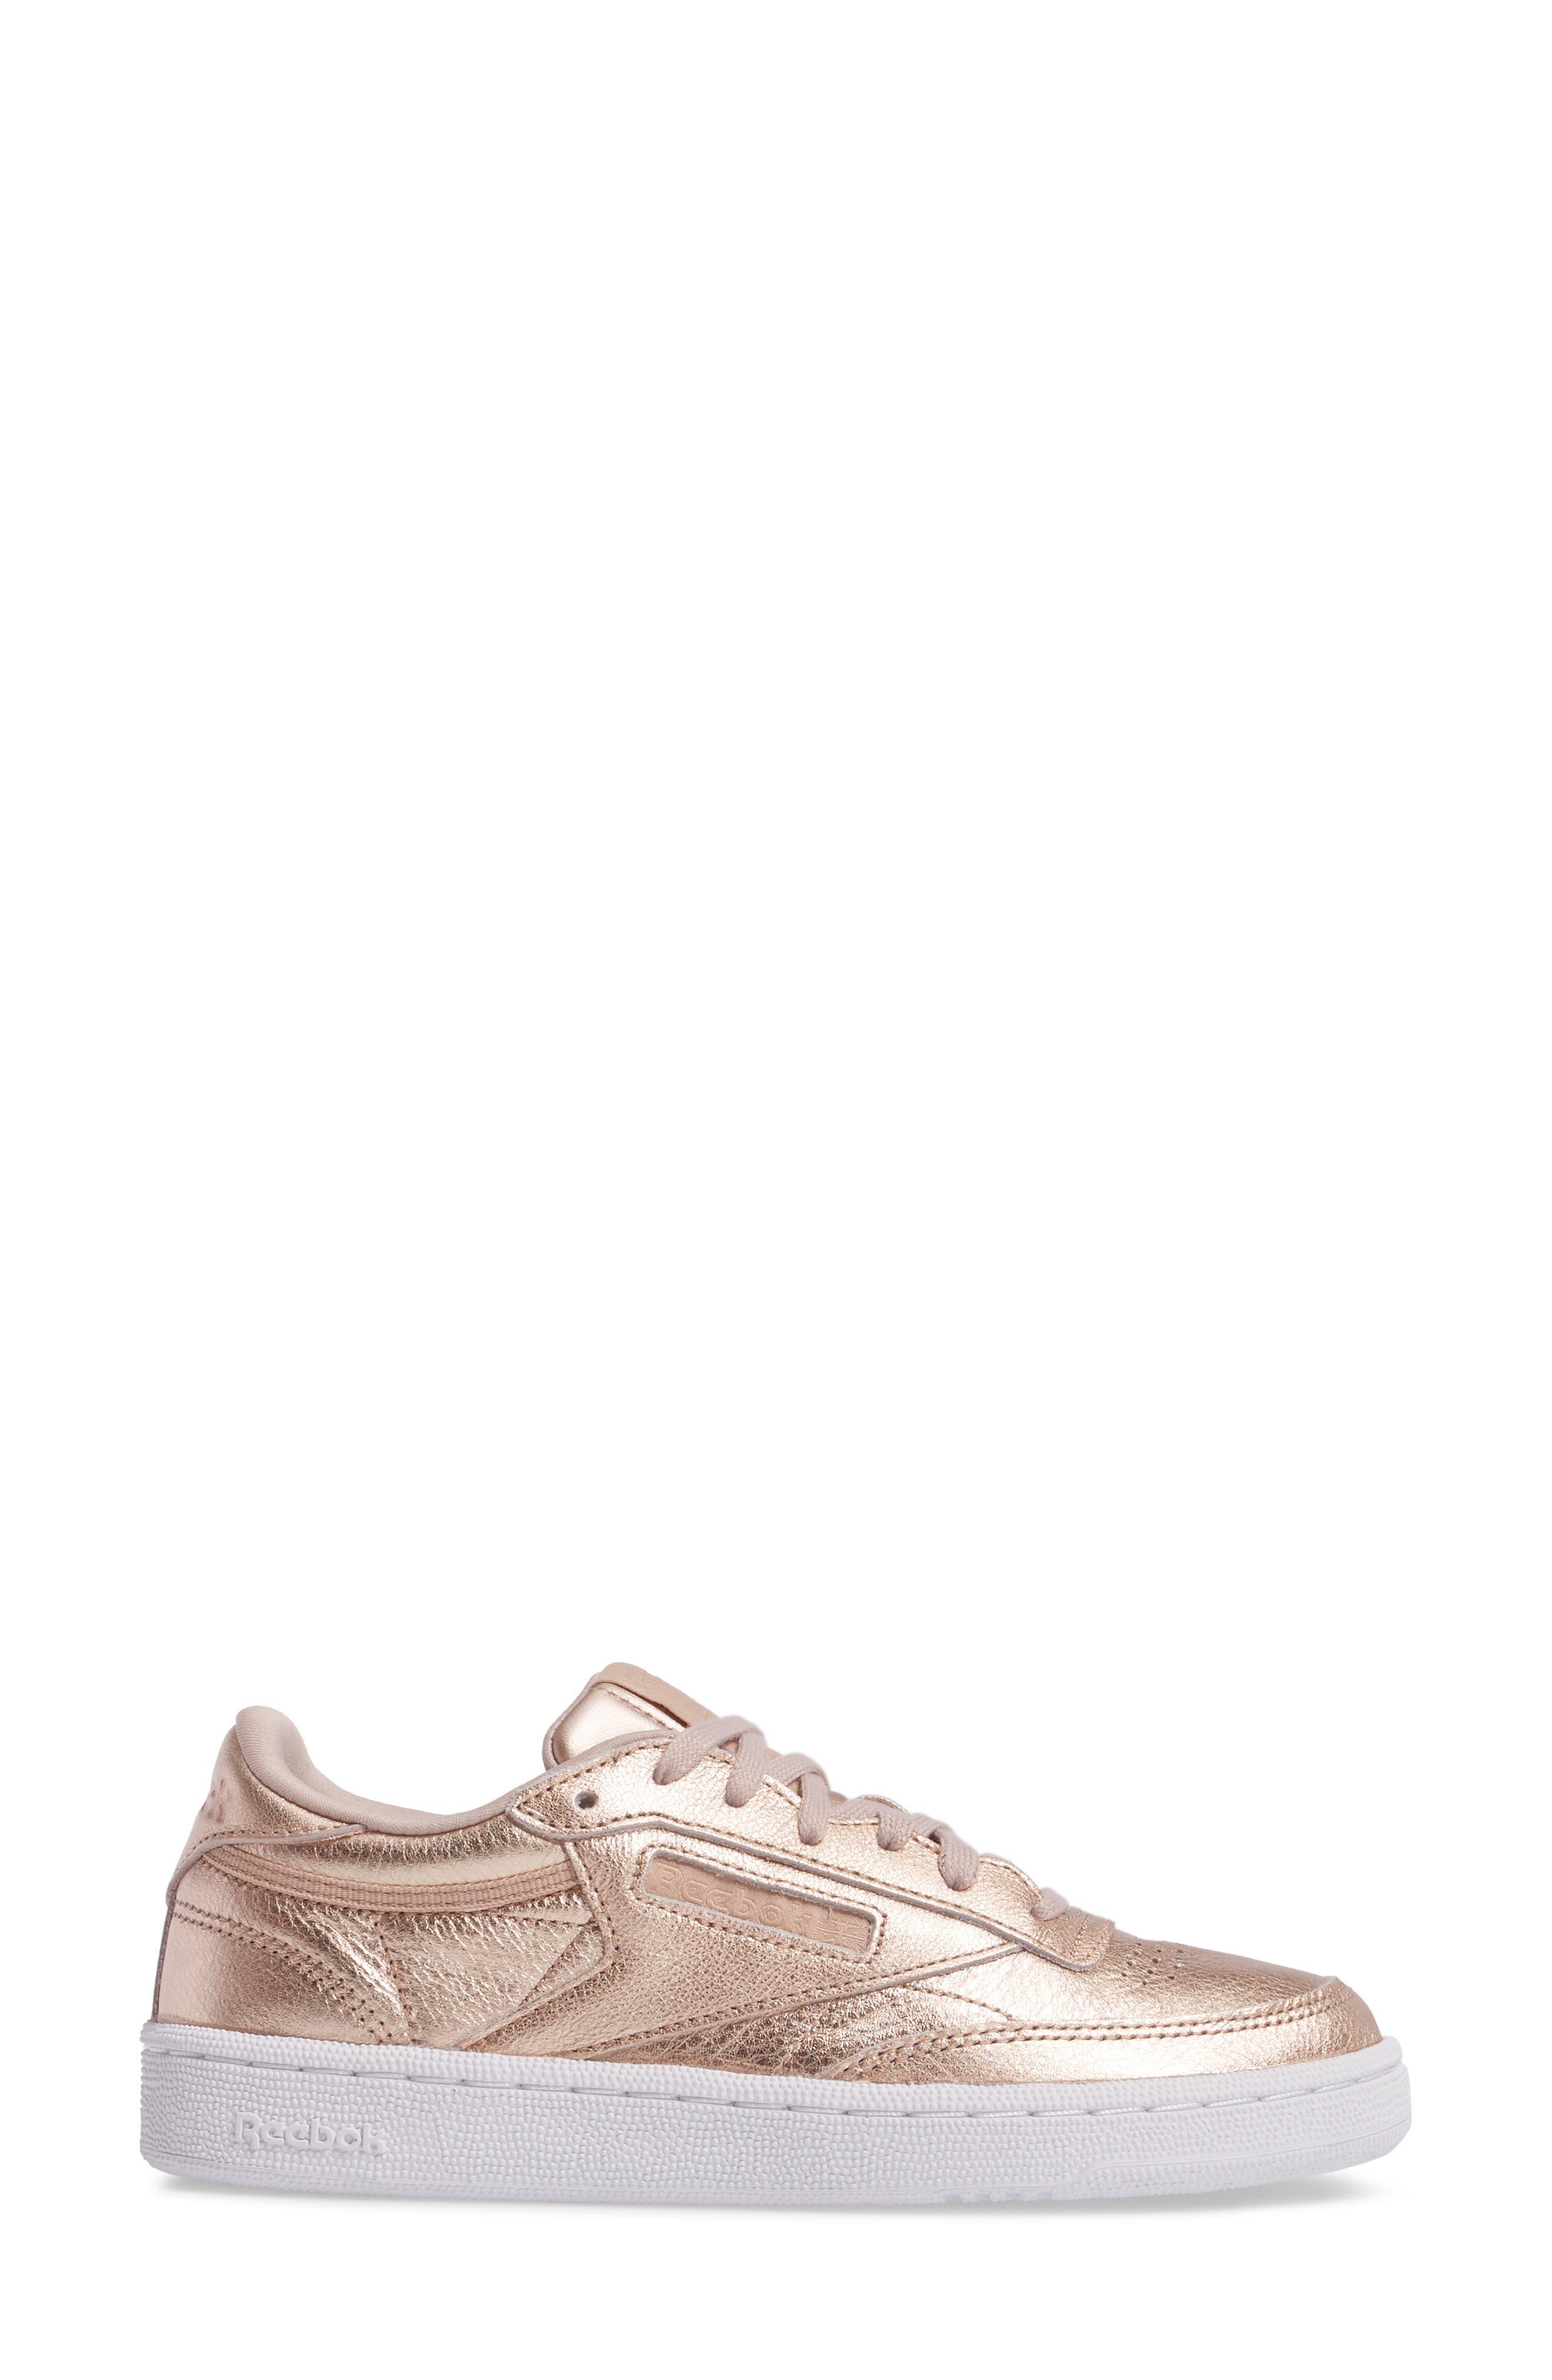 Club C 85 Sneaker,                             Alternate thumbnail 3, color,                             Peach/ White Pearl